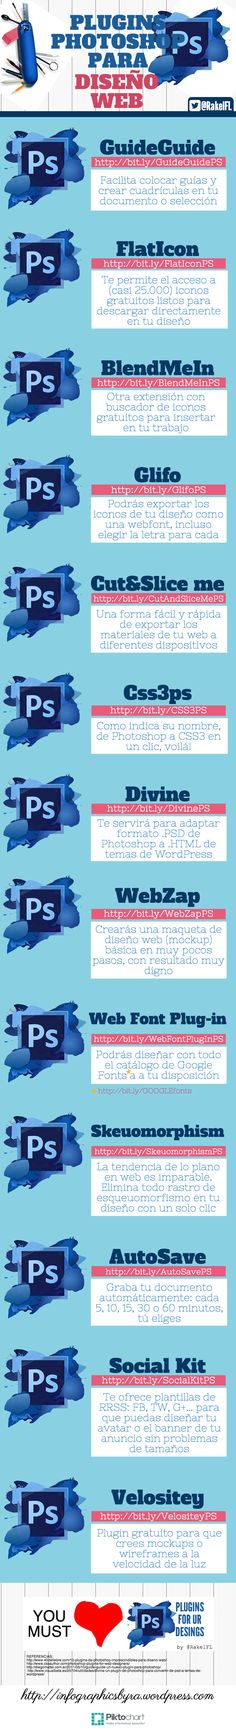 Plugins de Photoshop que facilitan el Diseño Web Web Design Tips, Tool Design, Layout Design, Desing Inspiration, Photoshop Plugins, User Experience Design, Graphic Design Illustration, Mood, Lightroom